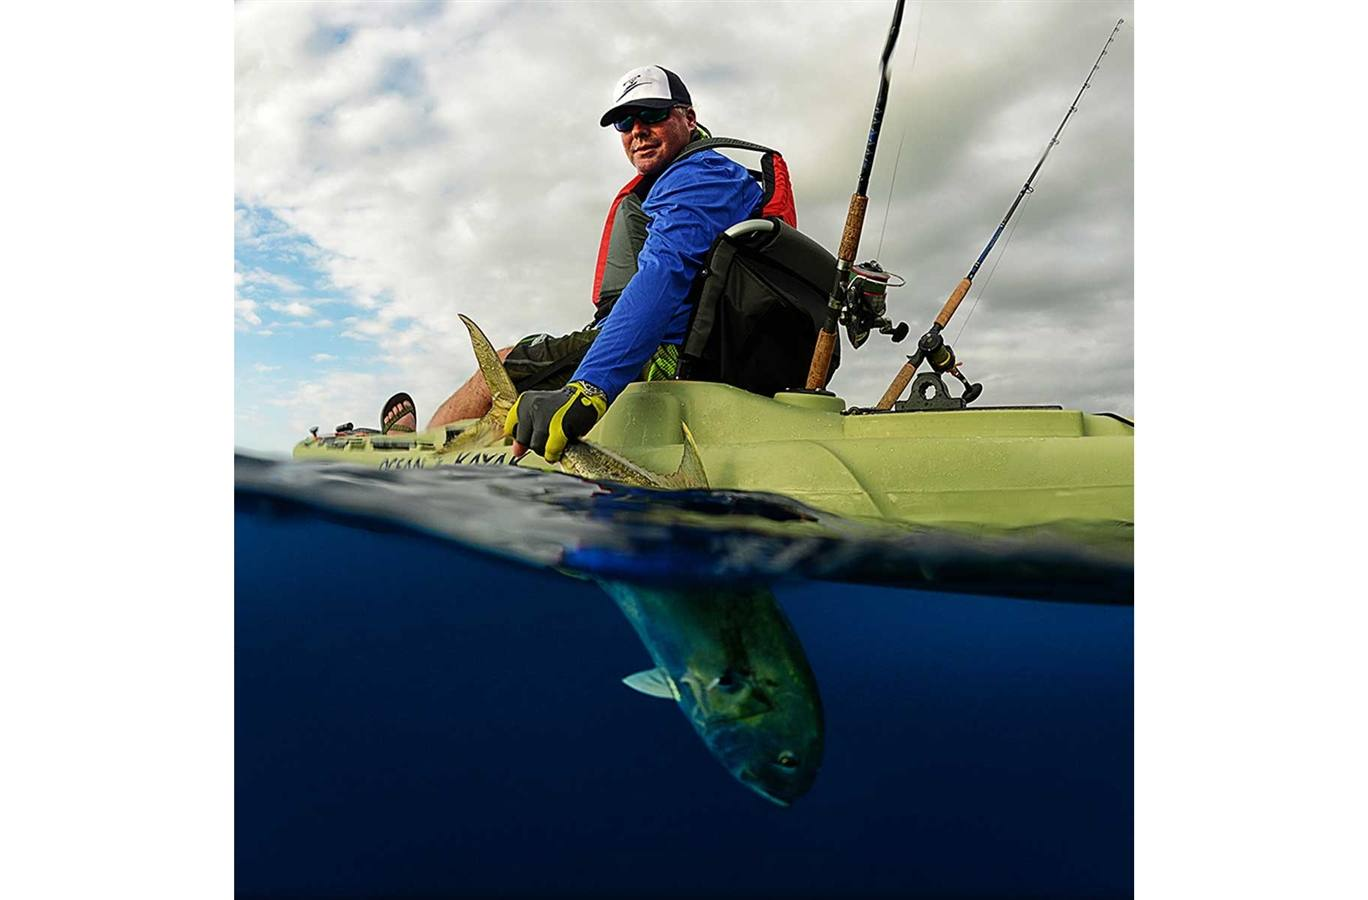 2019 Ocean Kayak Prowler Big Game II Angler for sale in